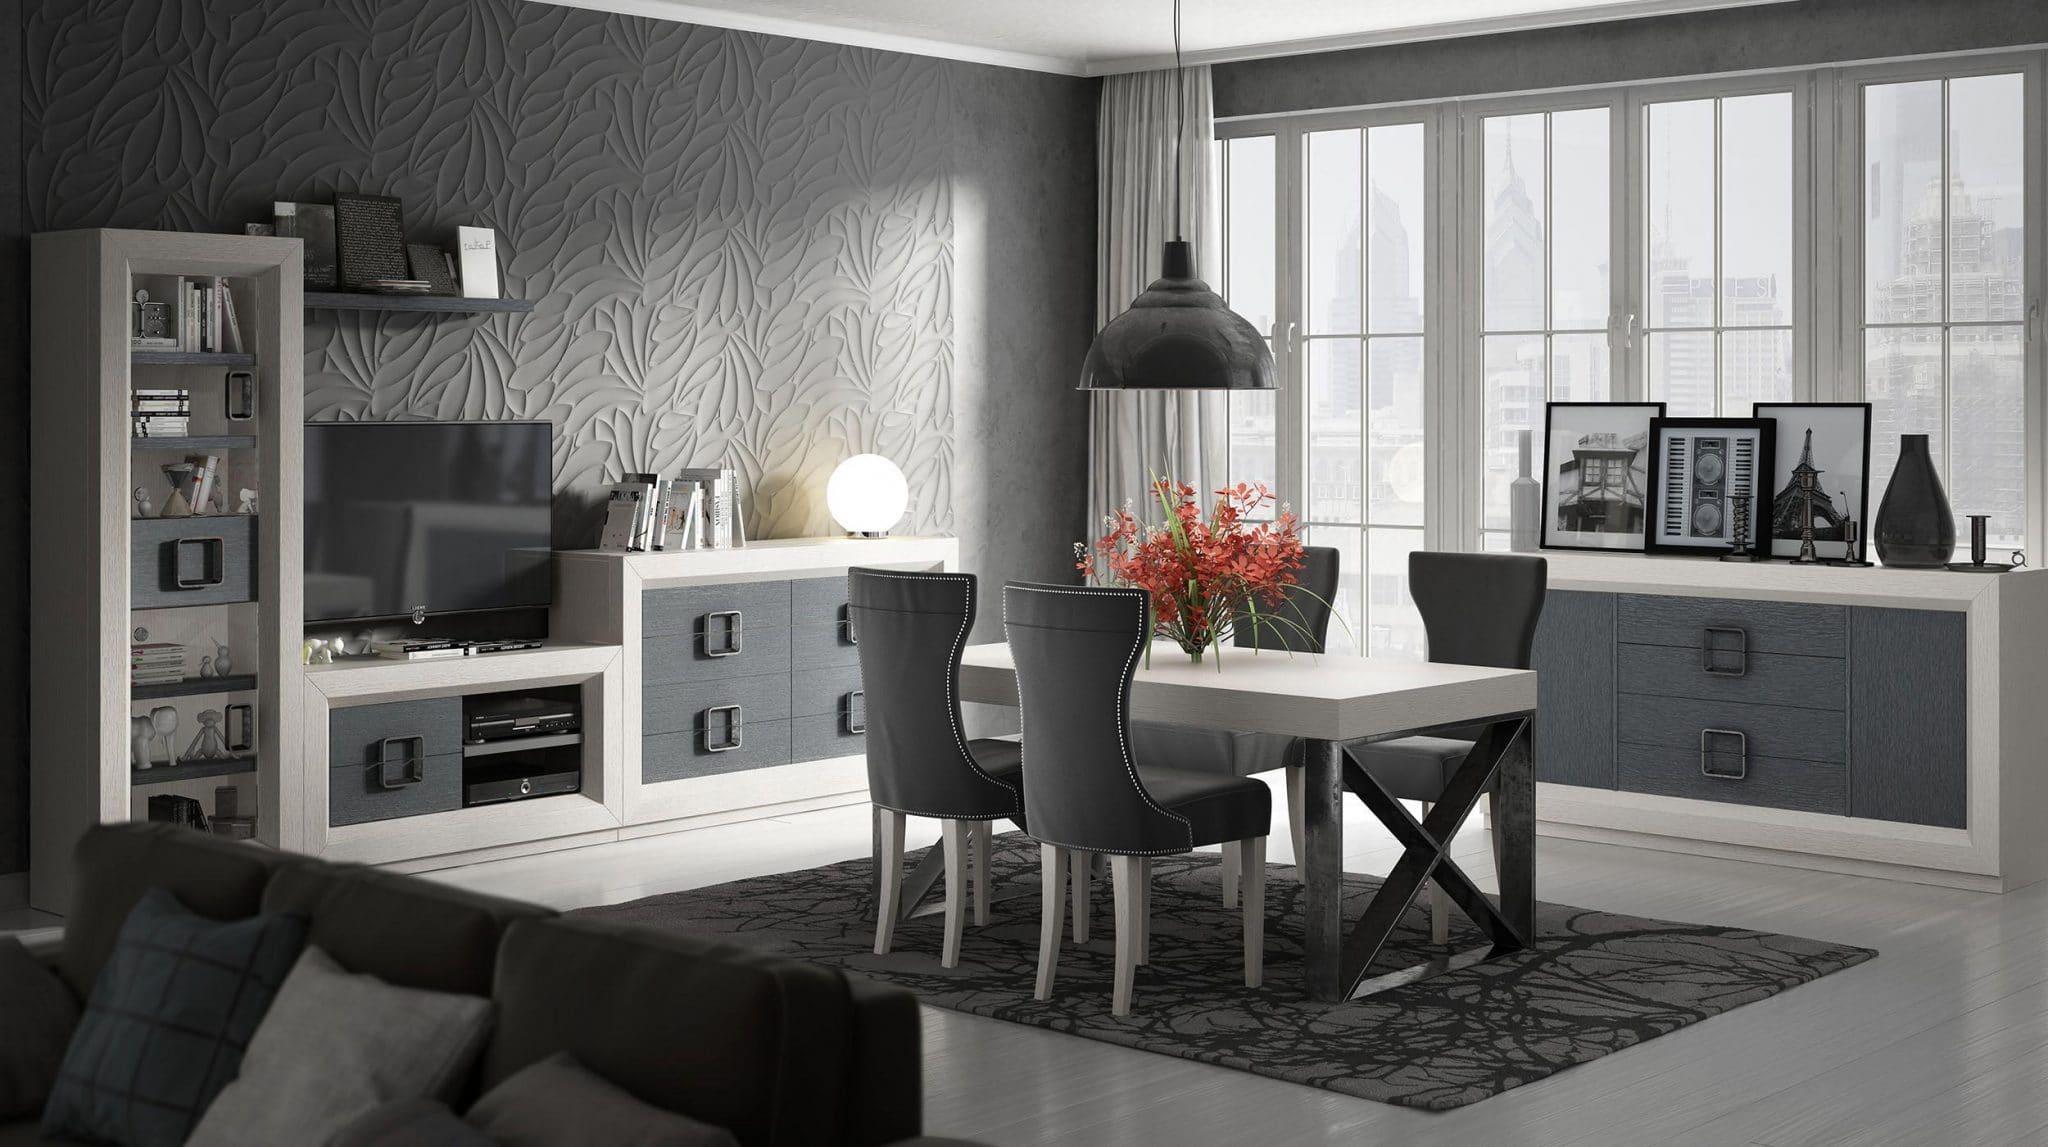 Salones muebles ogaru - Fabricantes de muebles de salon ...